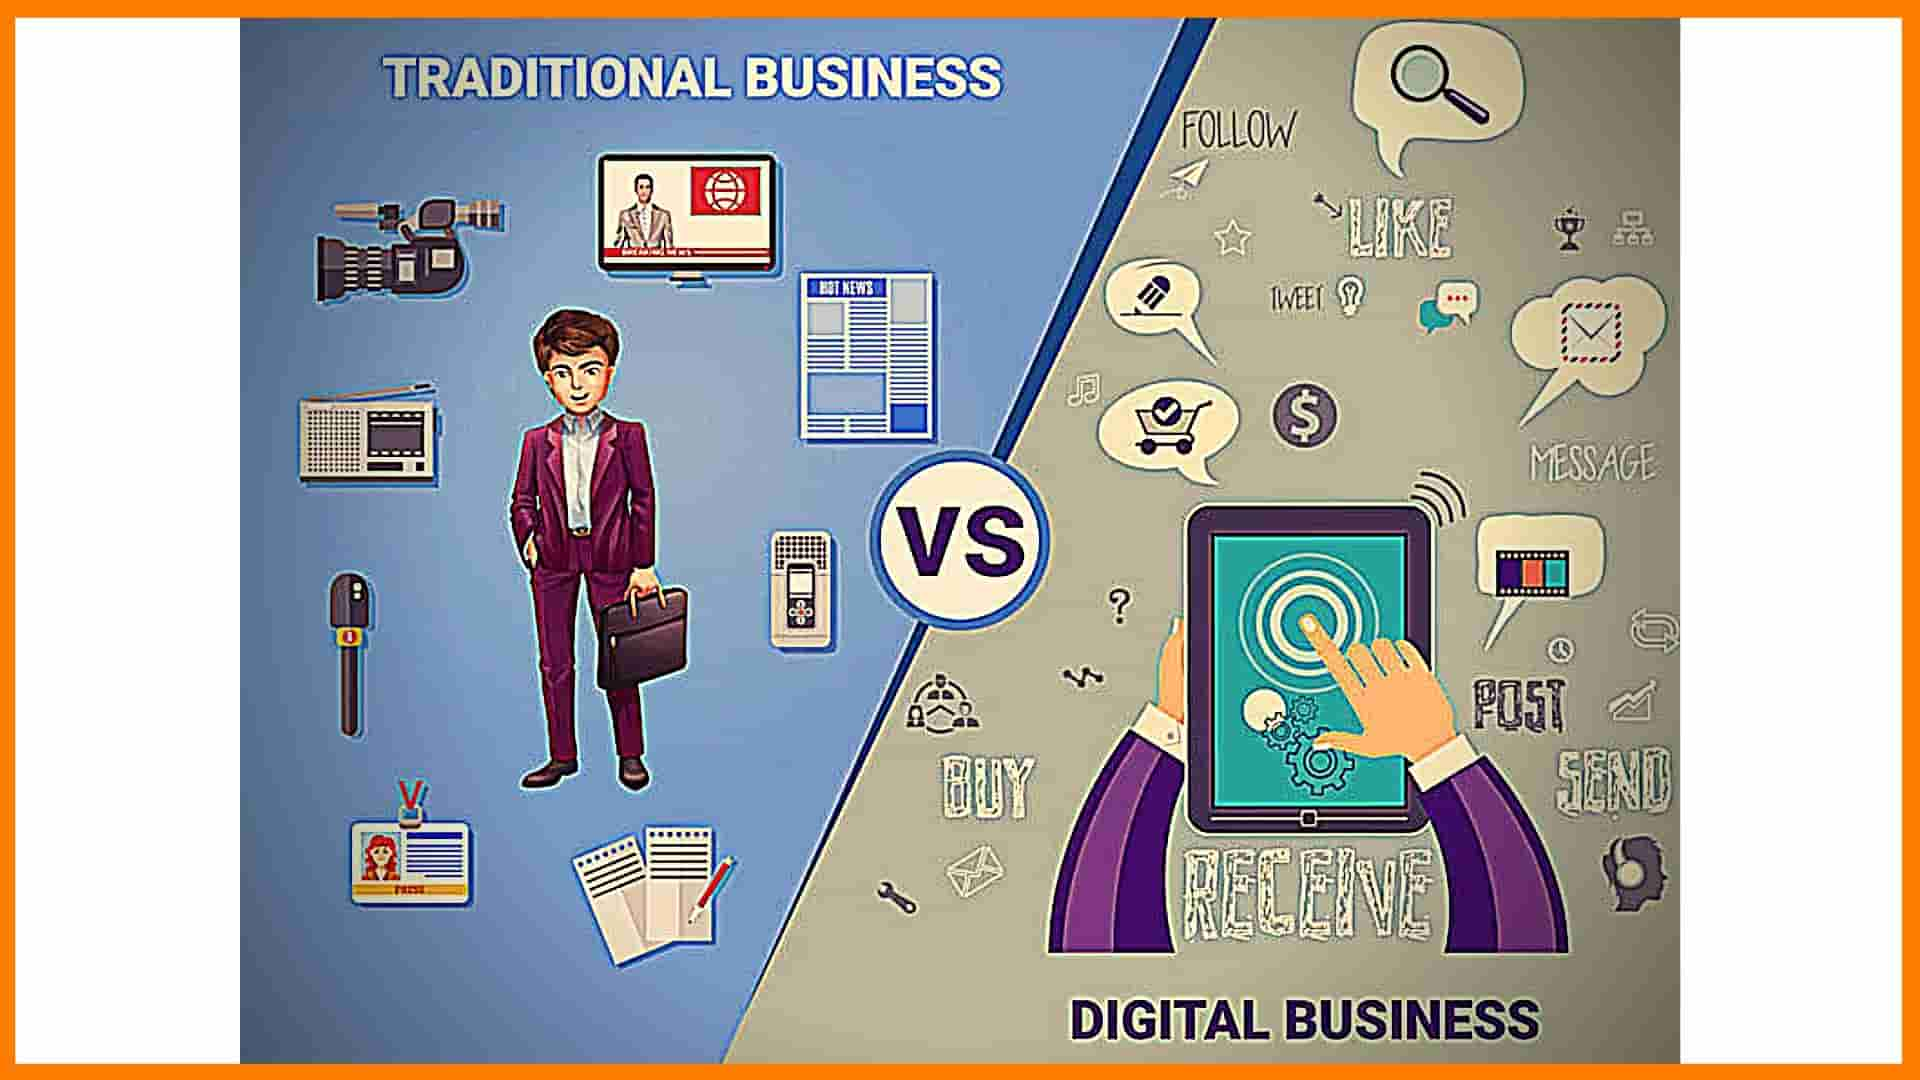 Traditional Business Vs Digital Business